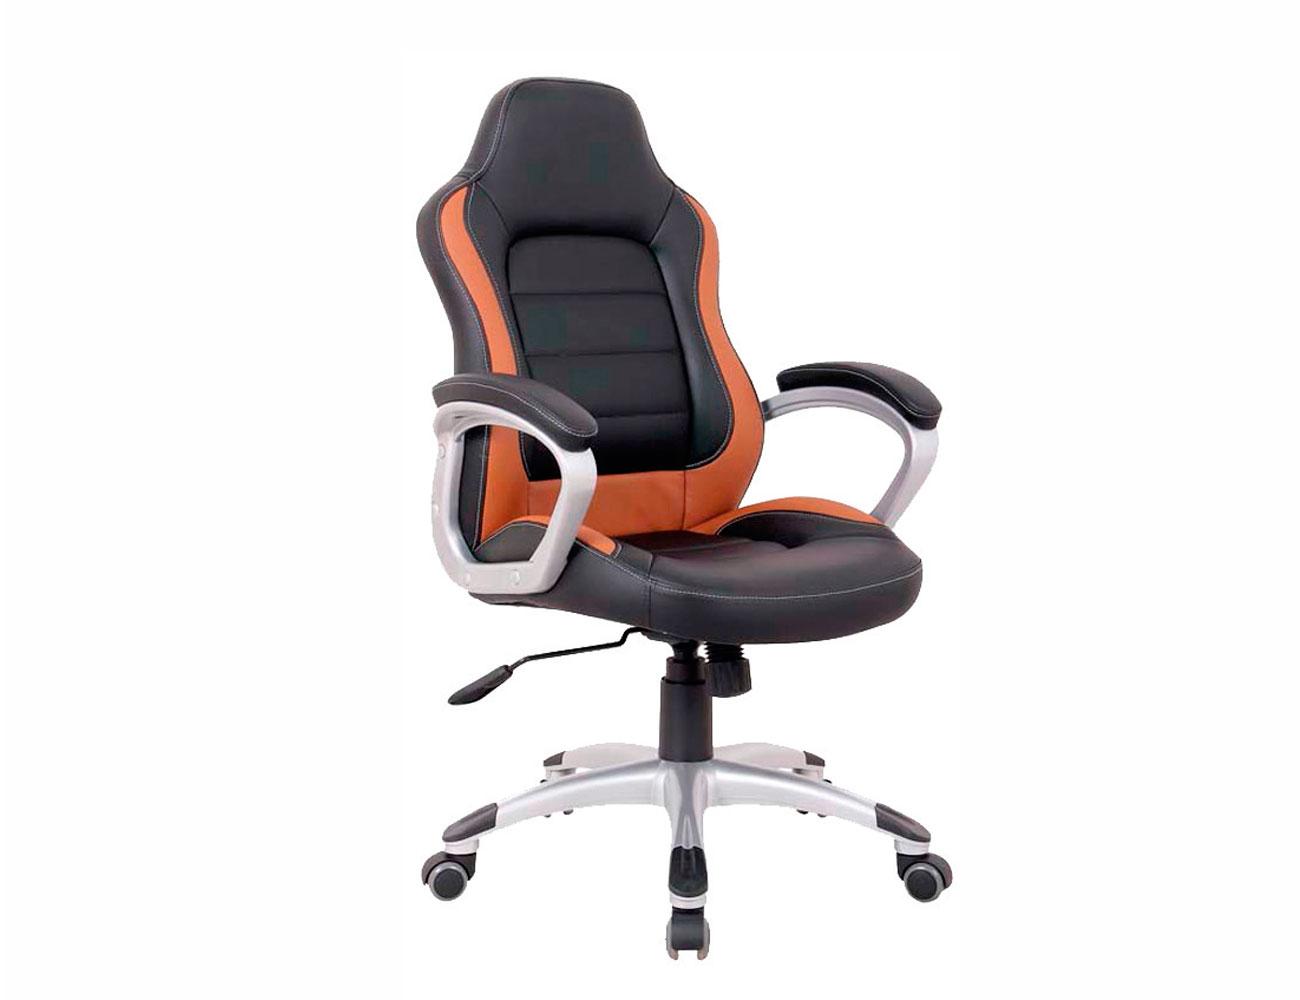 Silla oficina ergonomica polipiel brazos ruedas marron